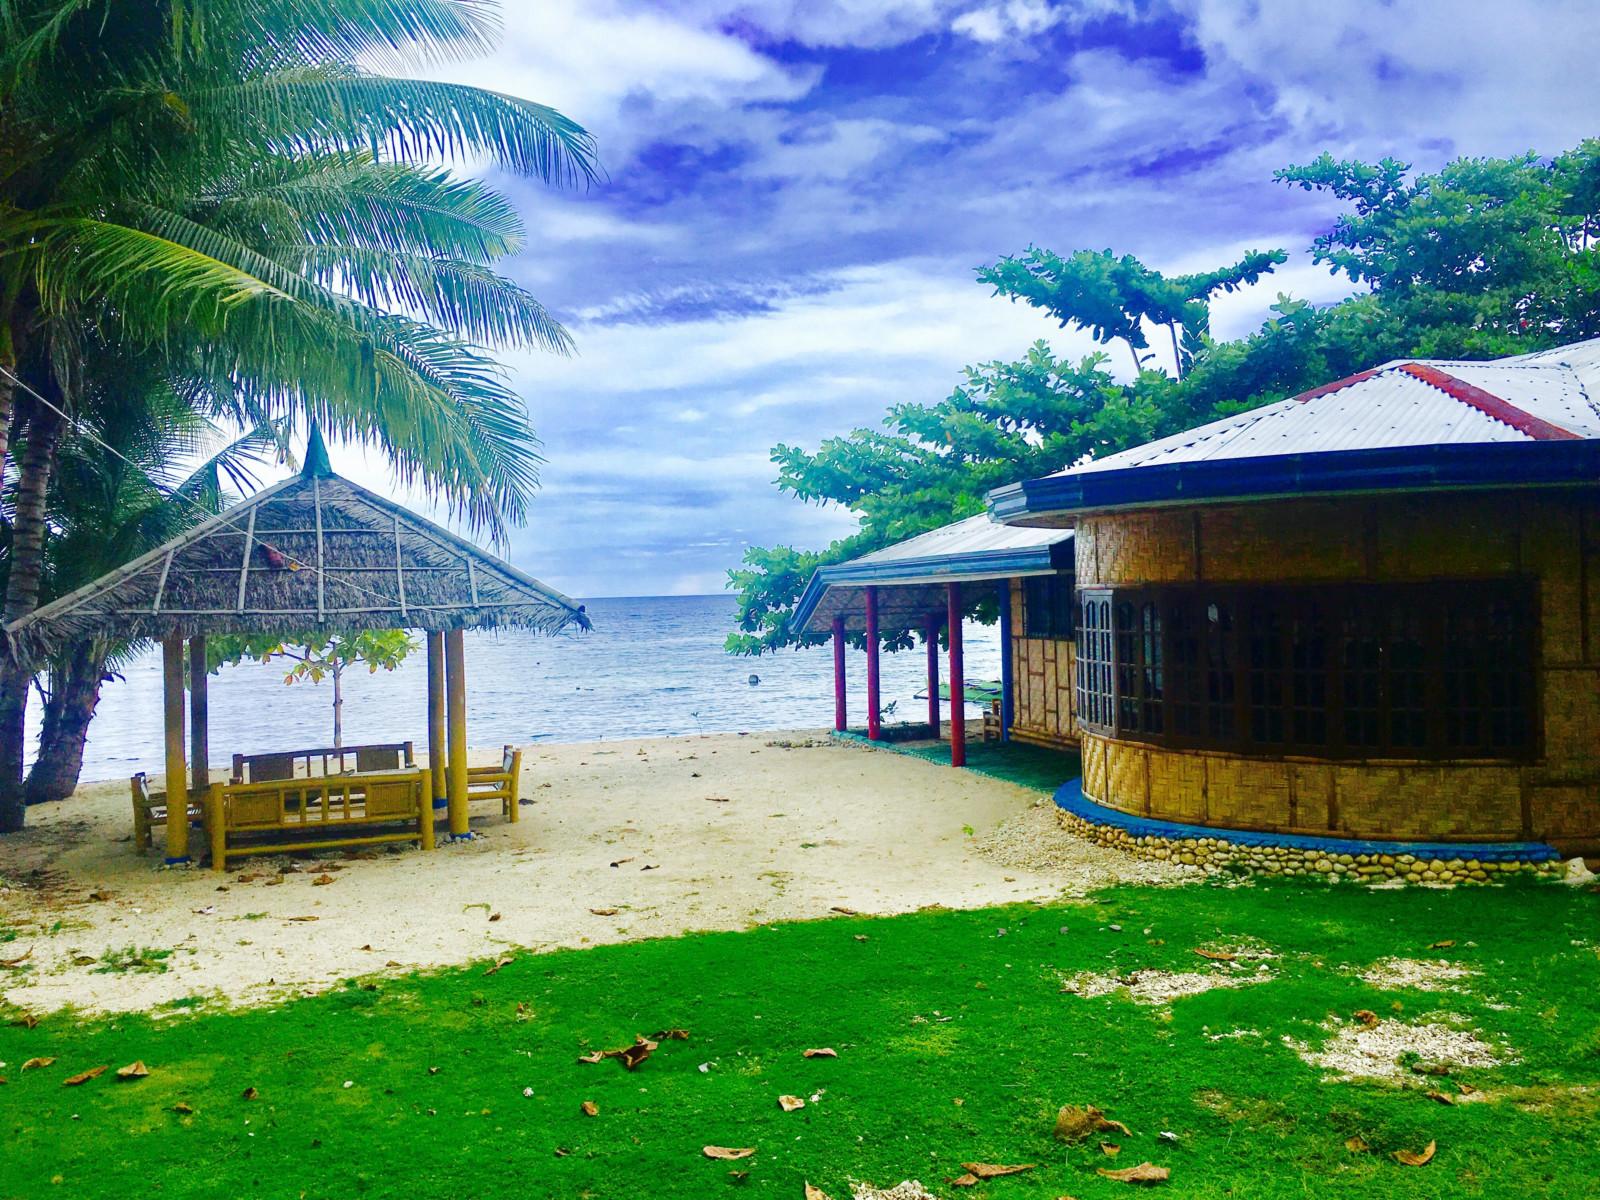 SIQUIJOR BEACH RESORT FOR SALE IN SAN JUAN